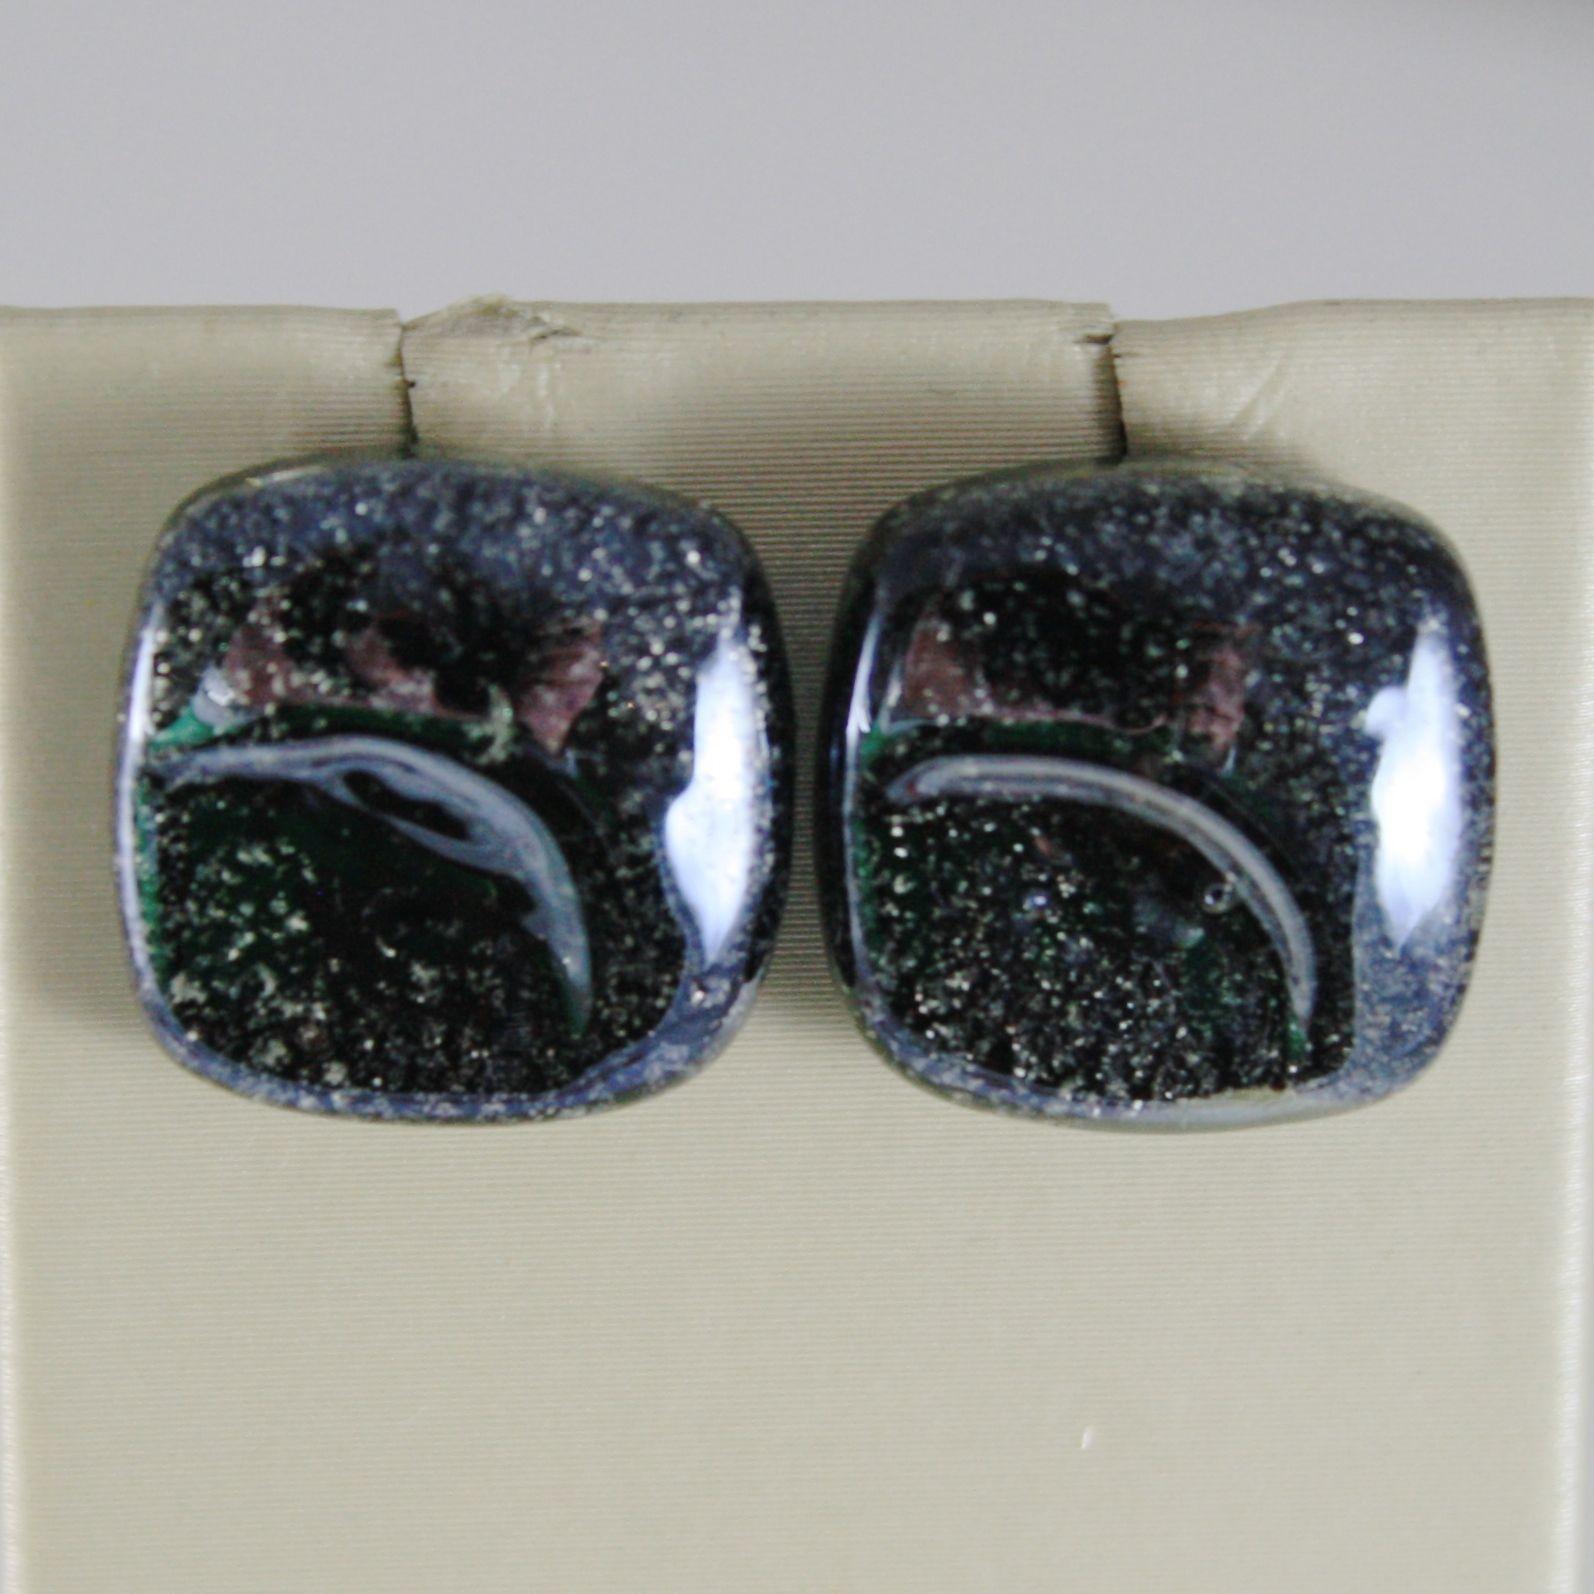 EARRINGS ANTICA MURRINA VENEZIA WITH MURANO GLASS GRAY AND BLACK OR530A14